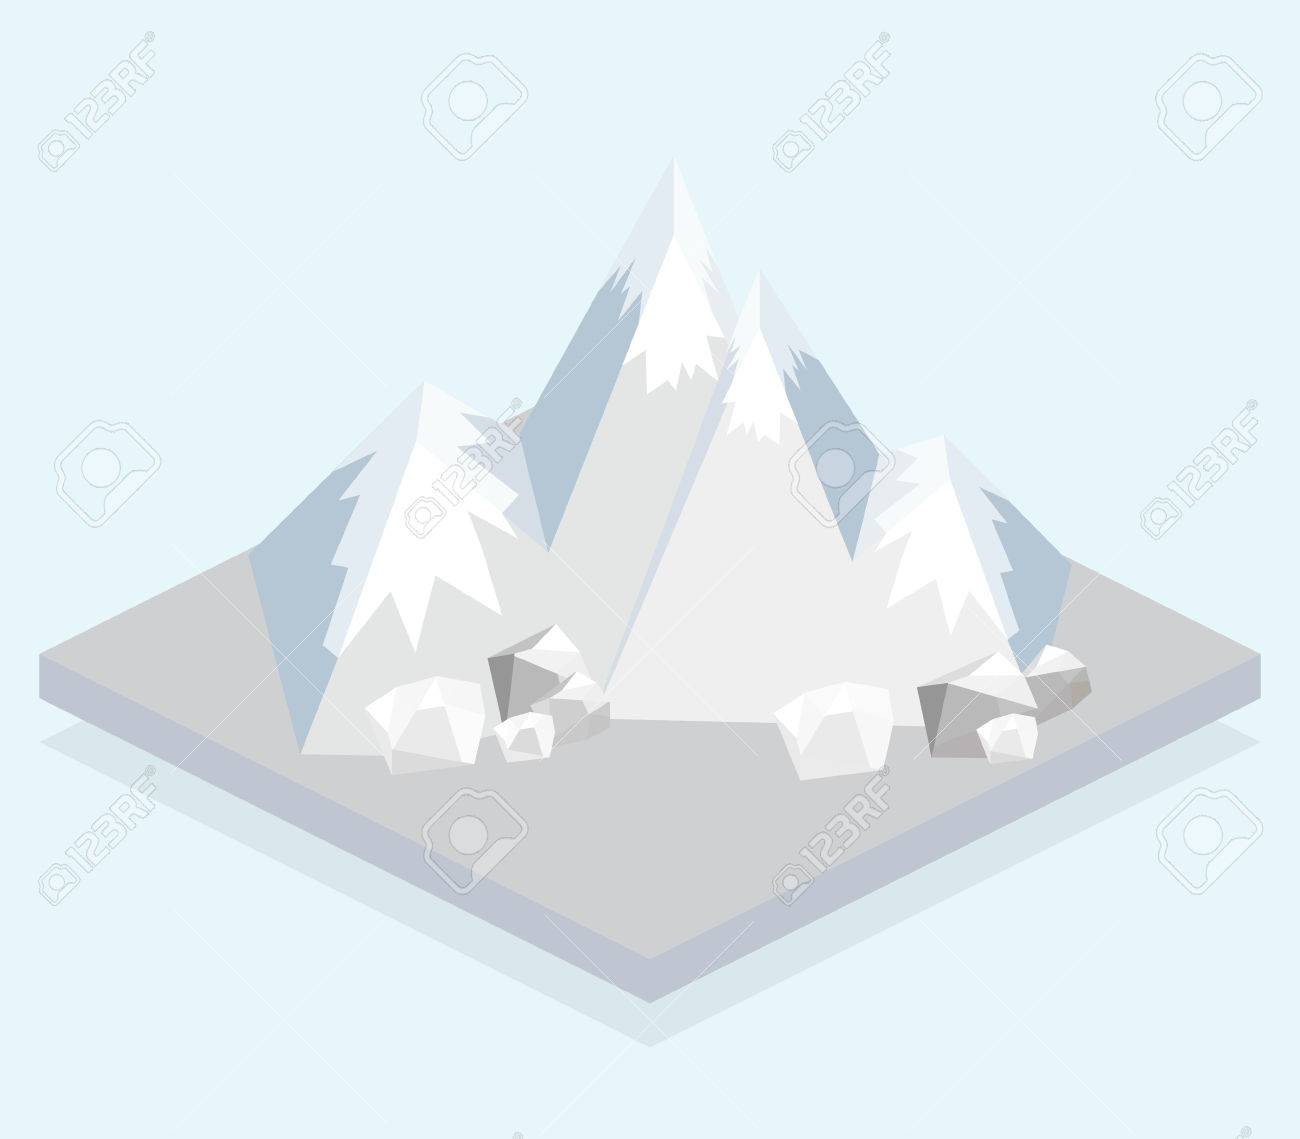 Ski Mountain. Isometric view. Fun cartoon map elements. Stock Vector - 41586781